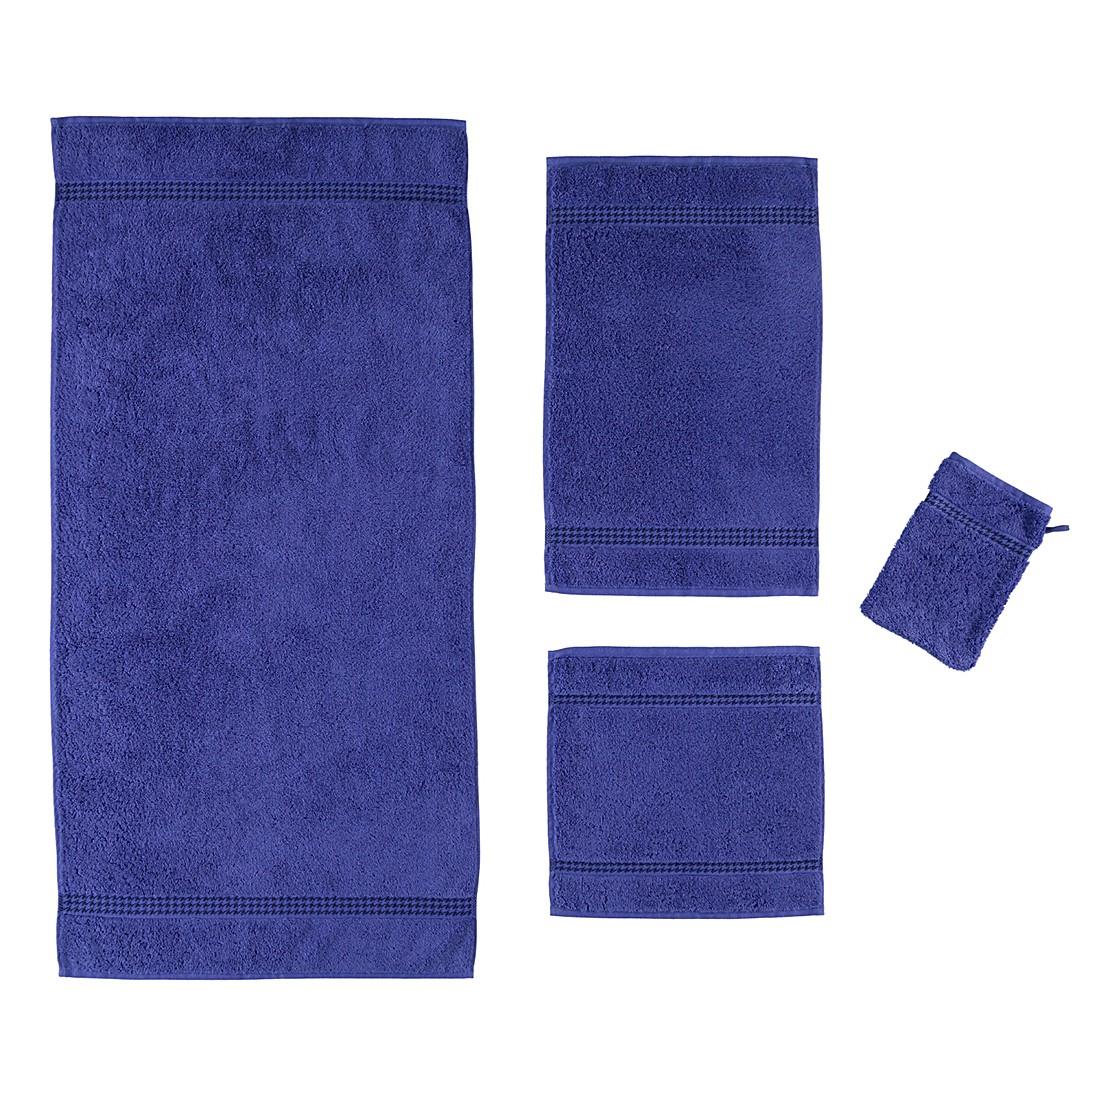 handt cher selection uni 4010 baumwolle saphir duschtuch 70x140 cm caw g nstig. Black Bedroom Furniture Sets. Home Design Ideas